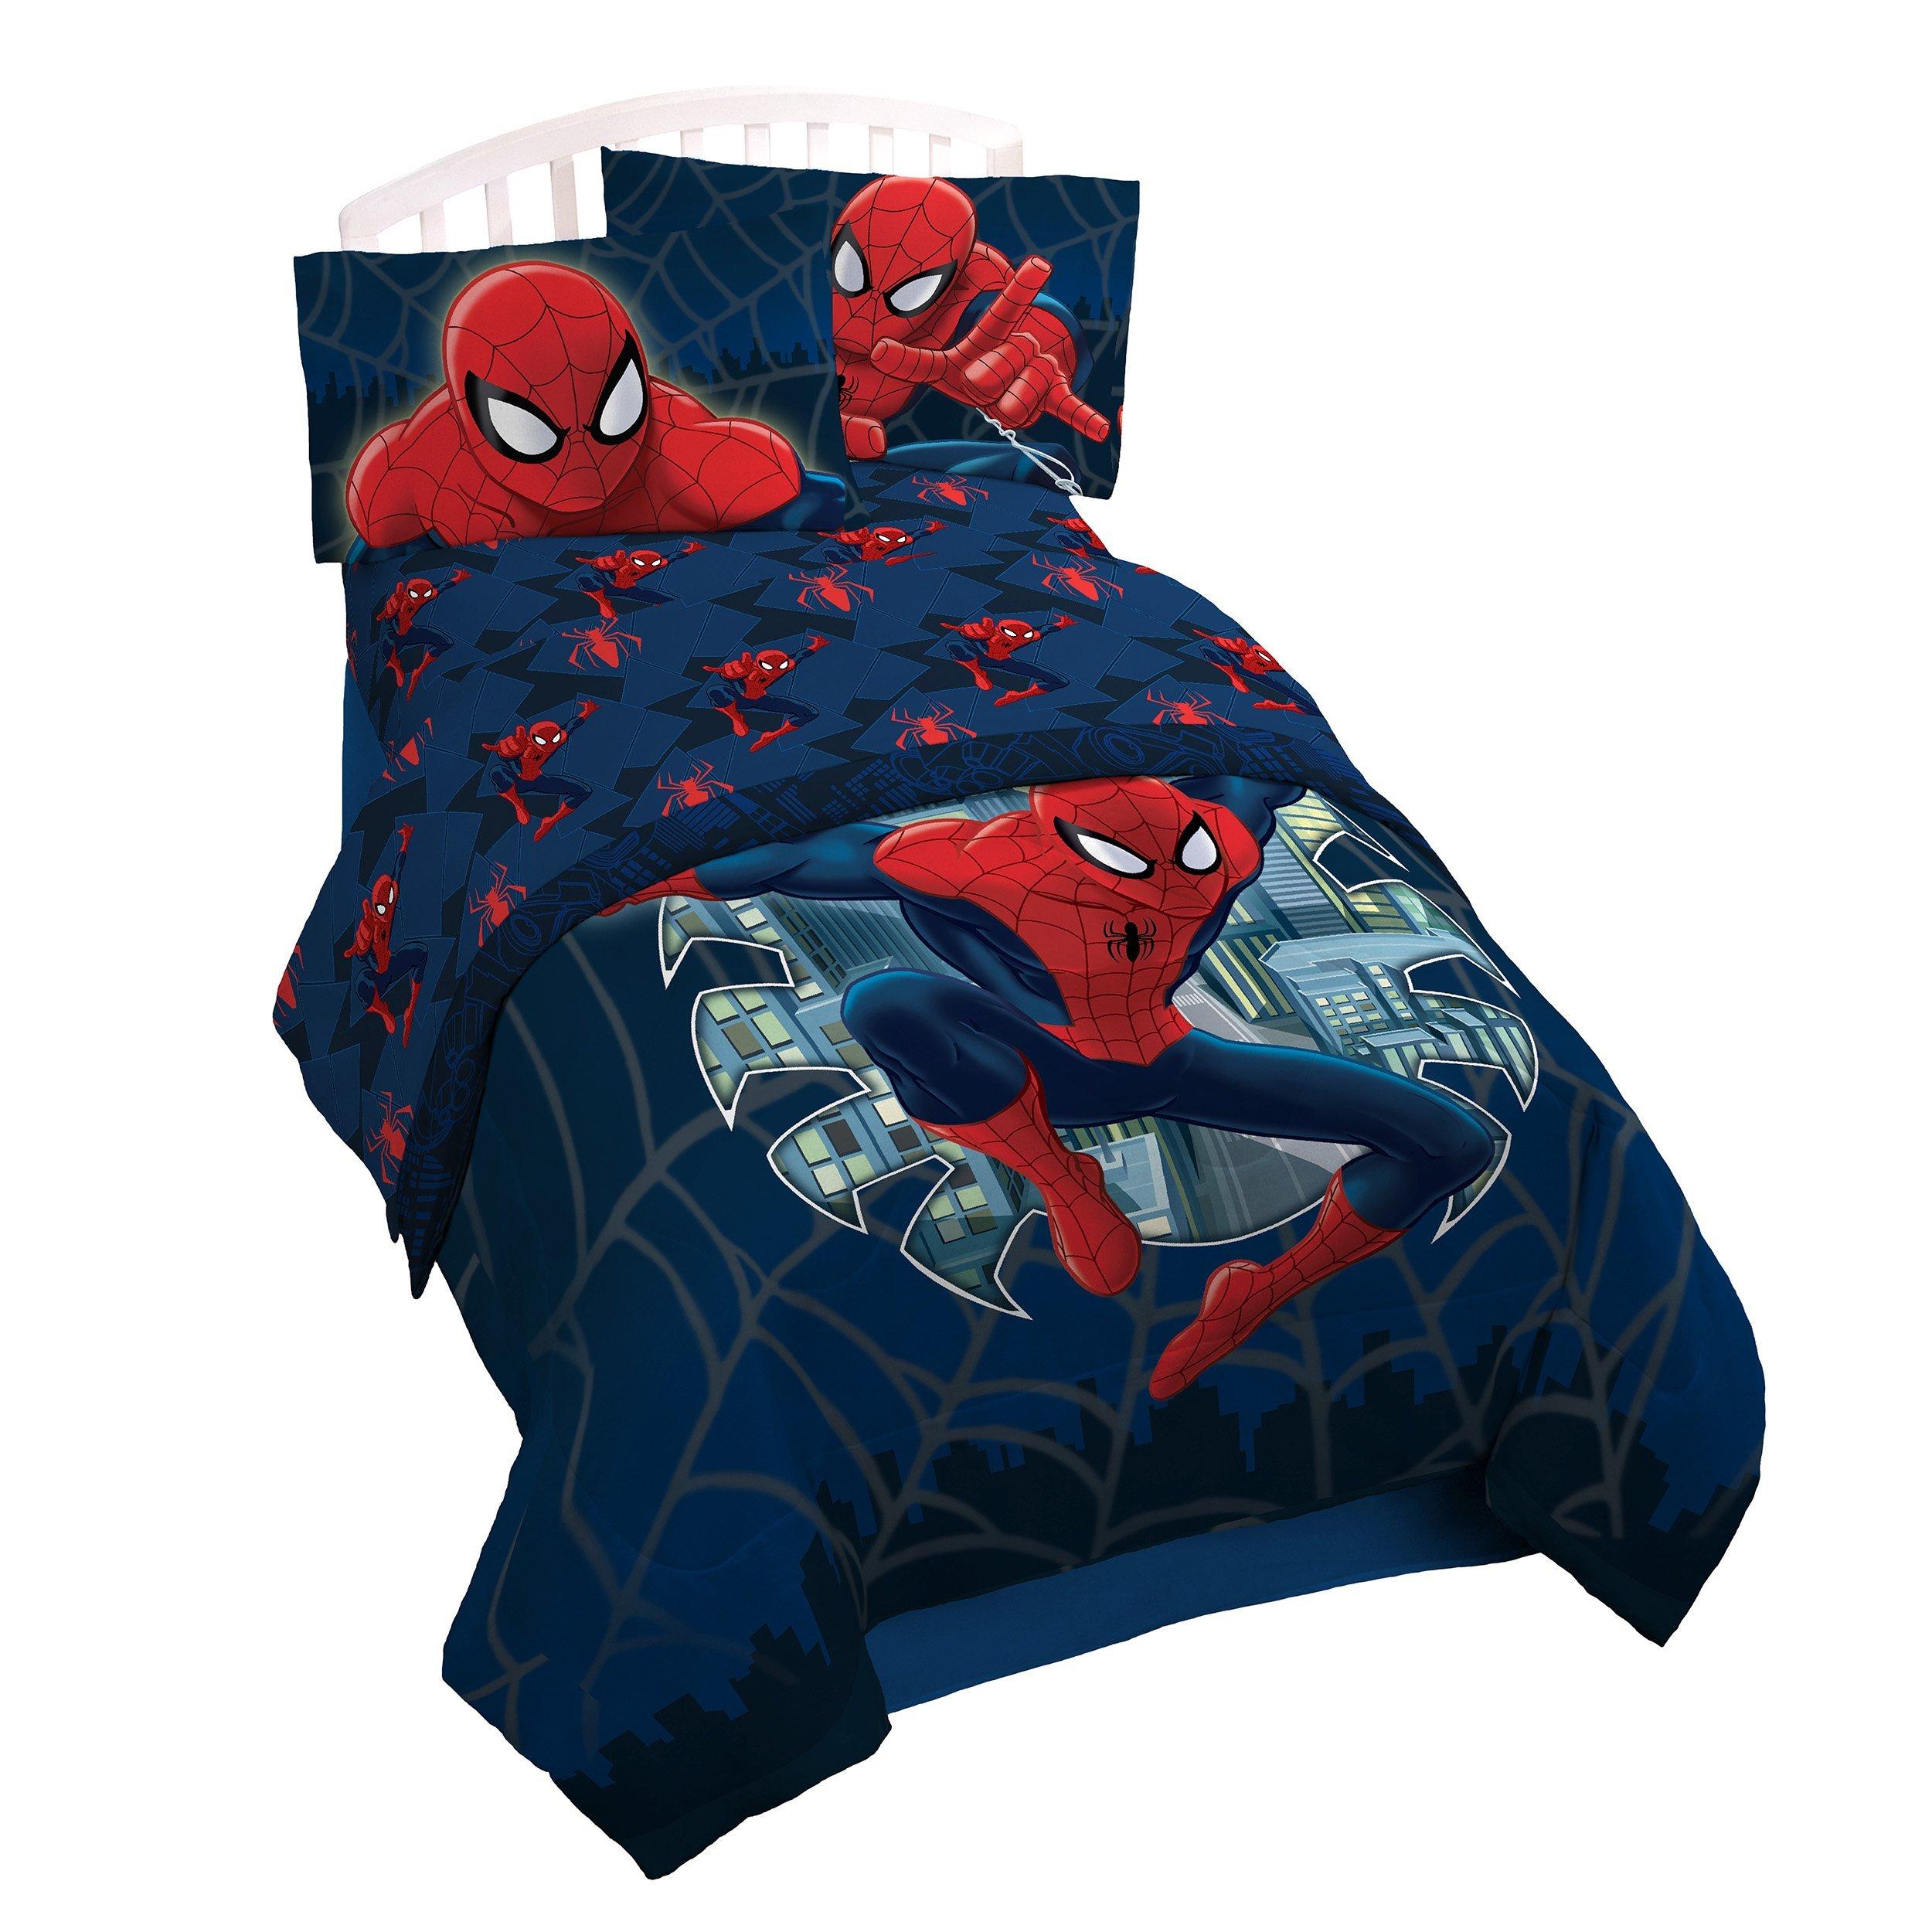 Marvel Spiderman 'Supreme' microfiber 3 Piece Twin Sheet Set